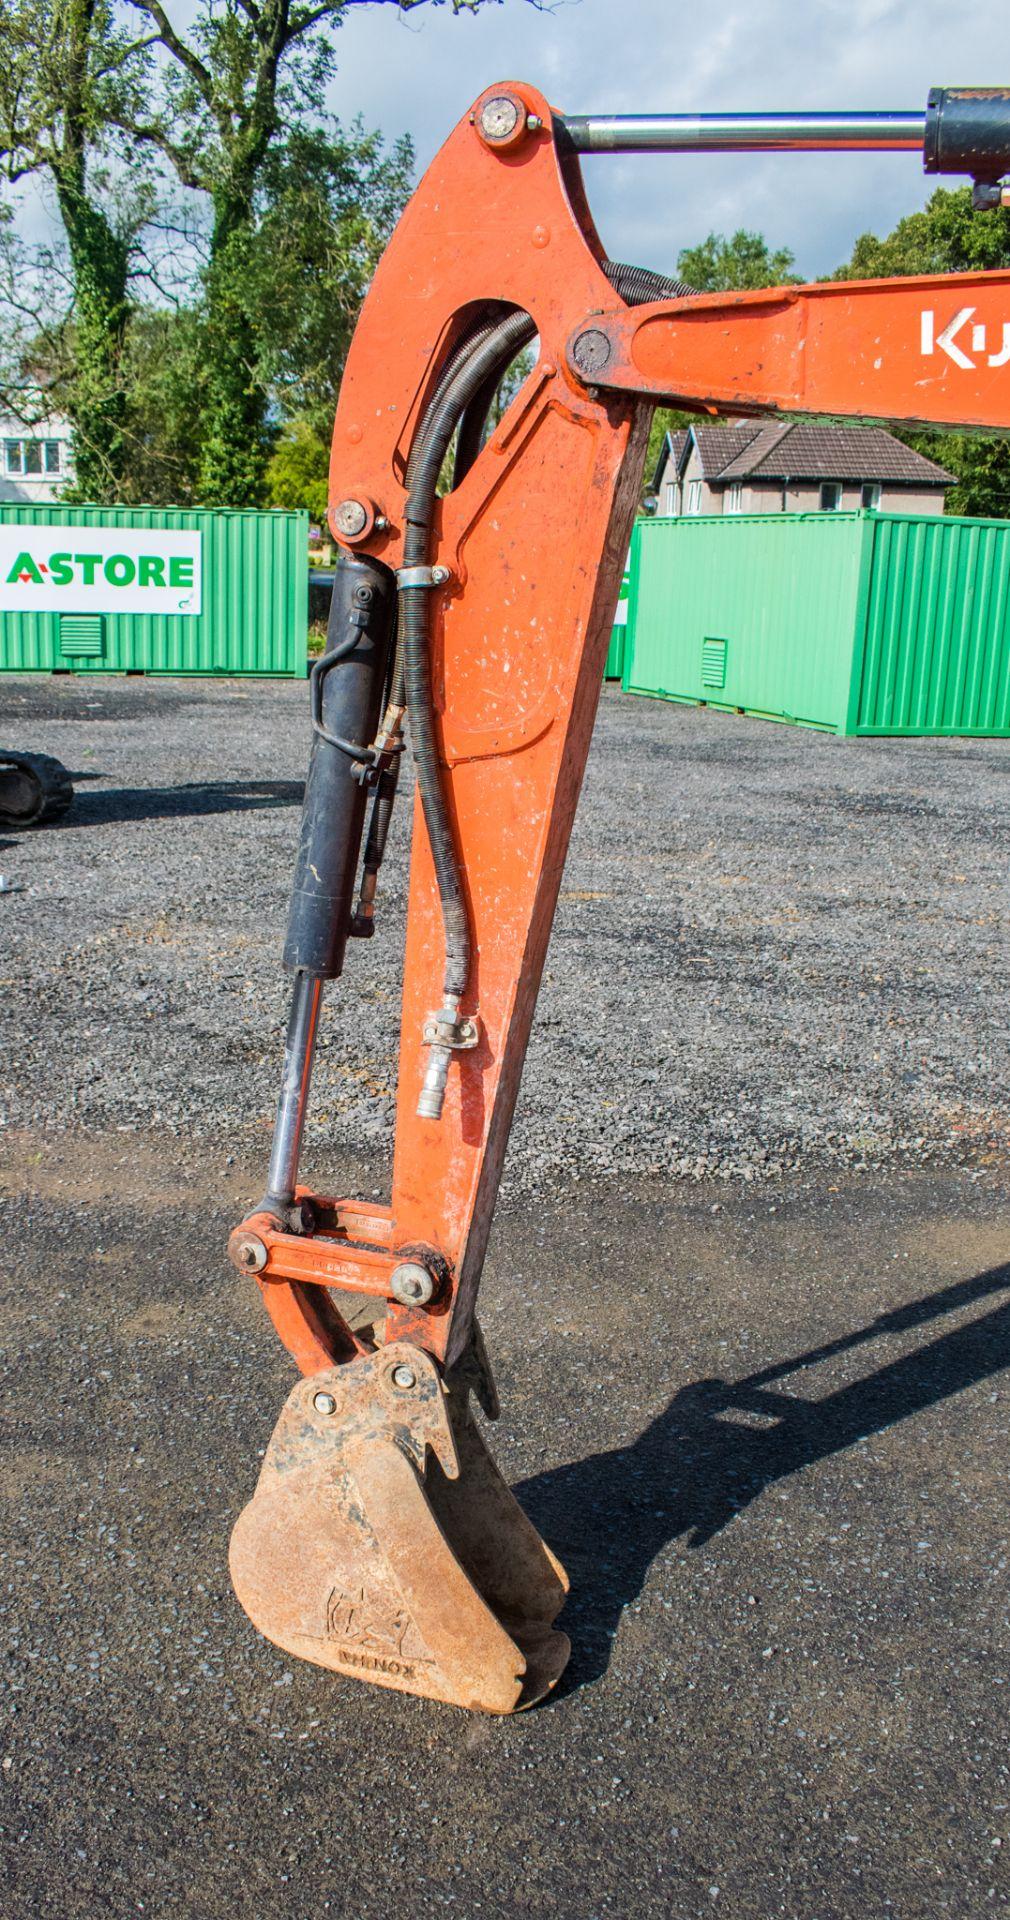 Lot 11 - Kubota U27-4 2.7 tonne zero tail swing rubber tracked mini excavator Year: 2016 S/N: 58403